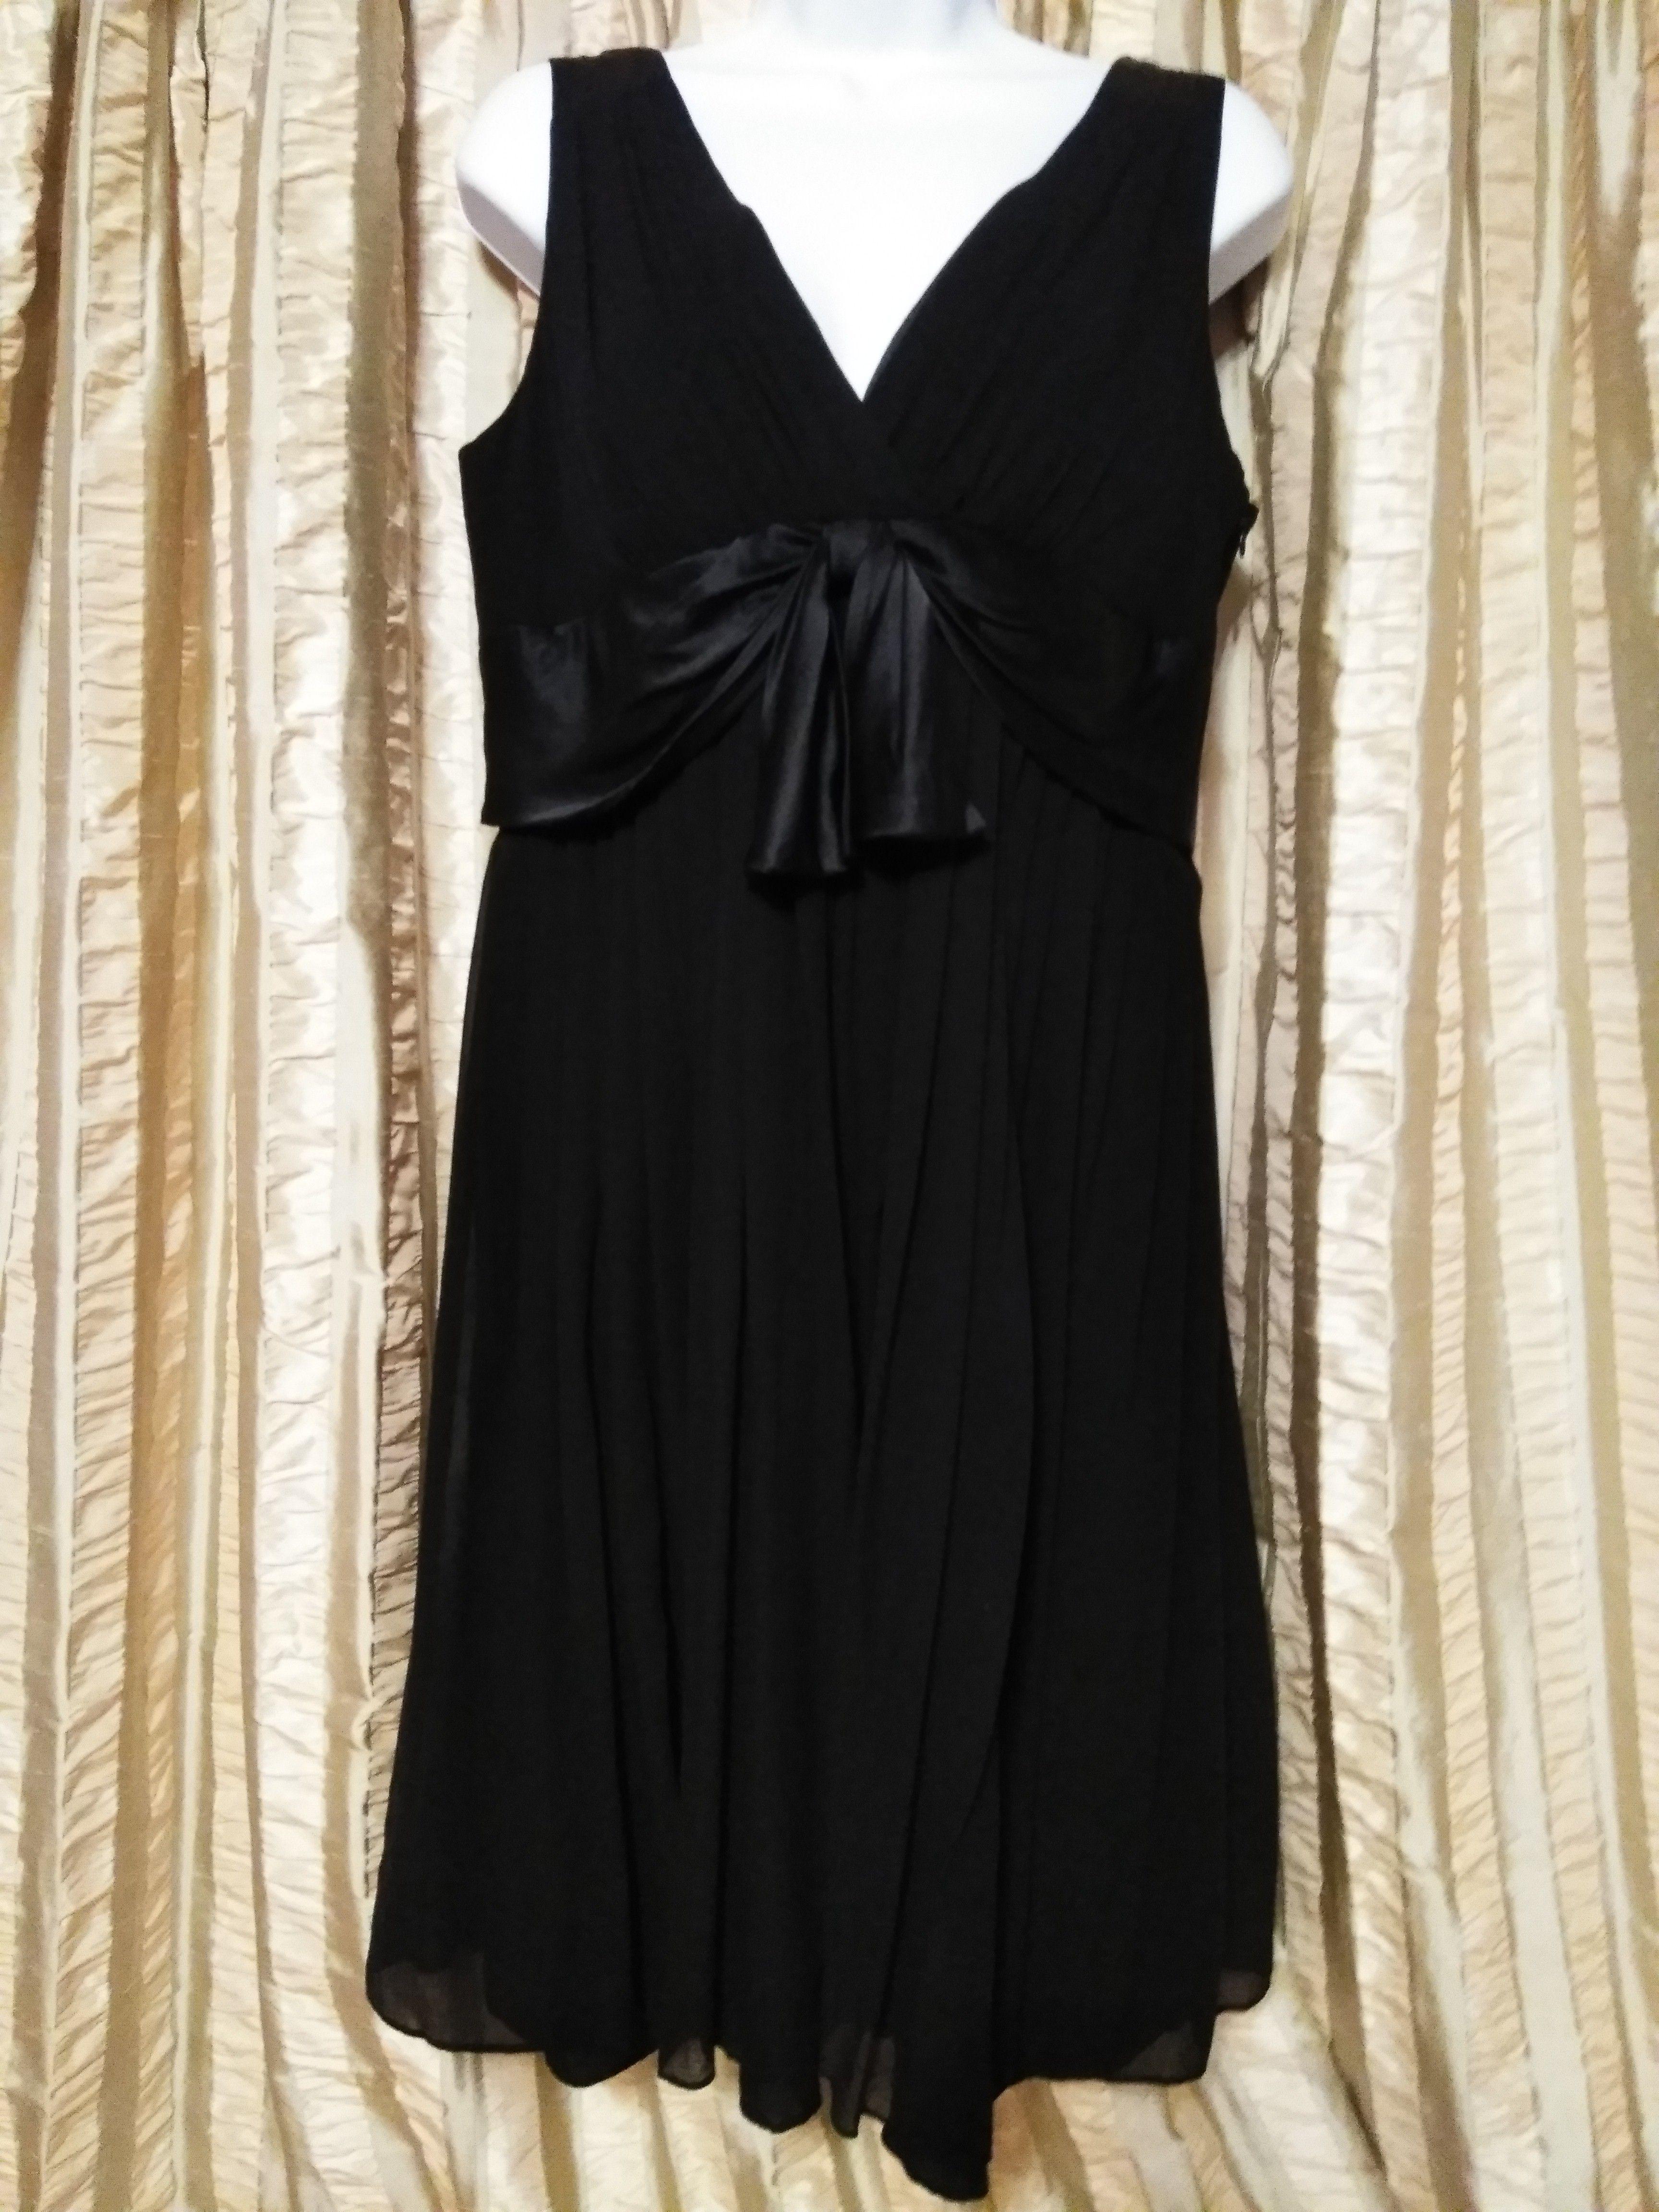 Maggy London Little Black Dress Size 16 Size 16 Dresses Little Black Dress Dresses [ 4608 x 3456 Pixel ]